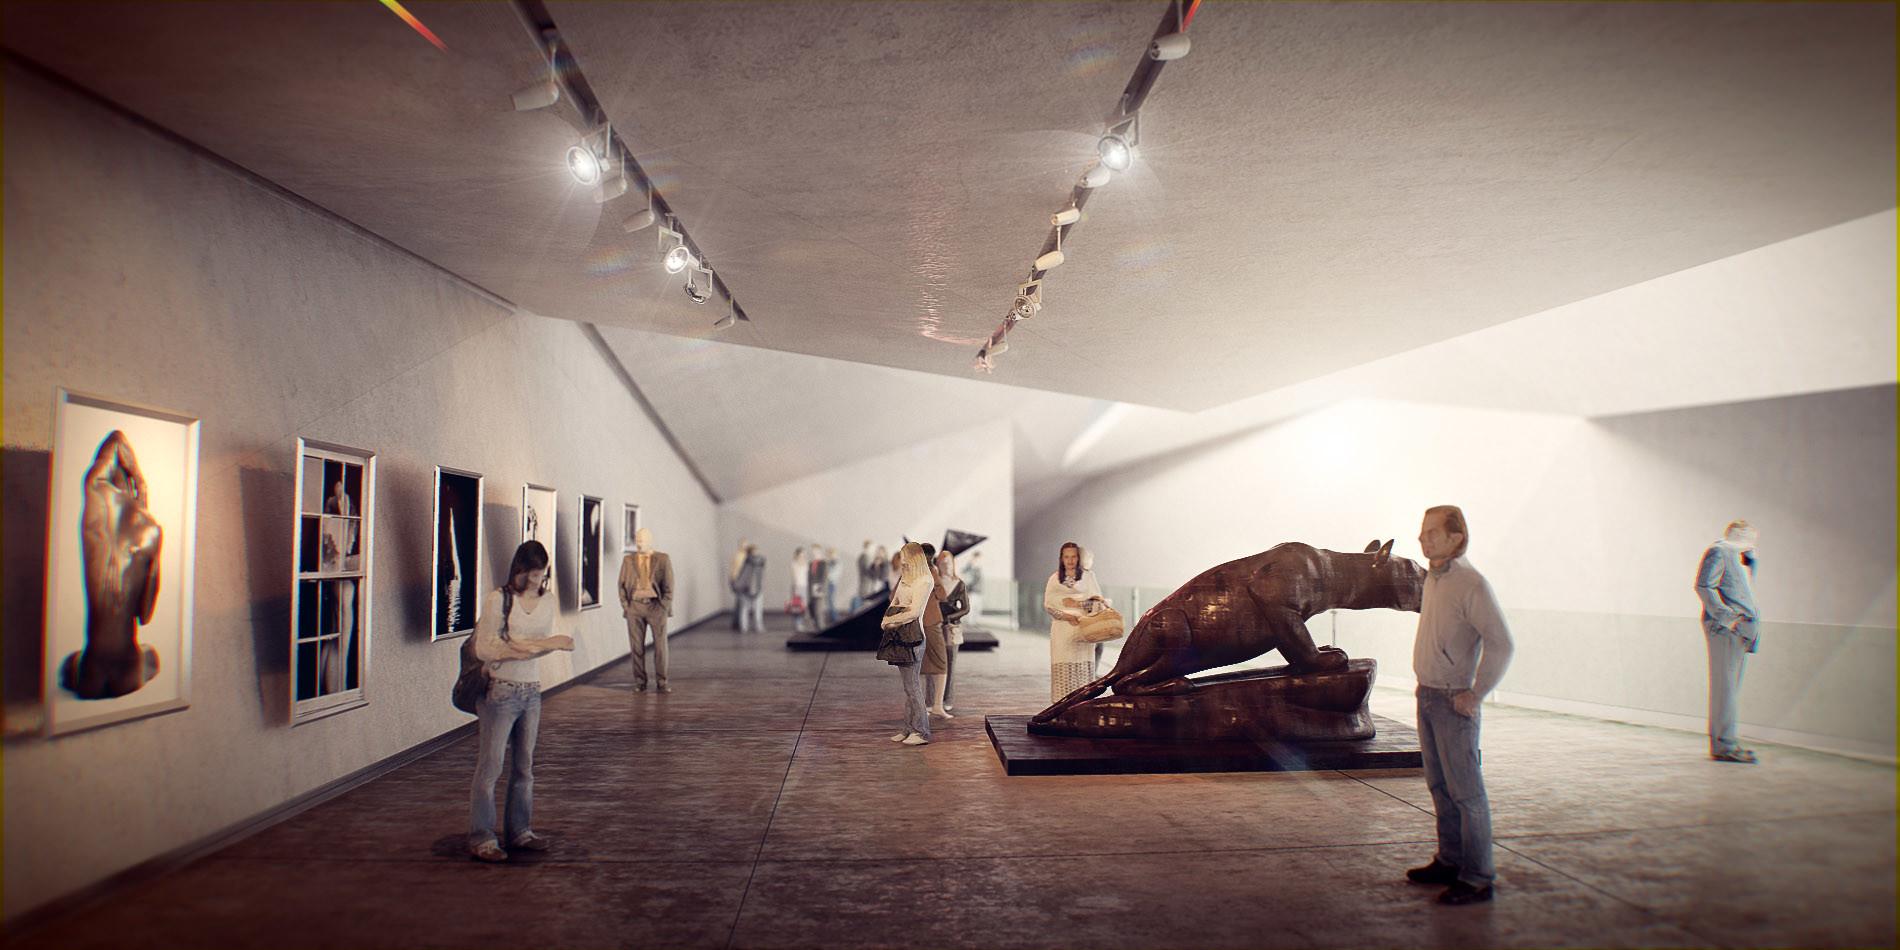 Bruno bolognesi sala del museo by bman2006